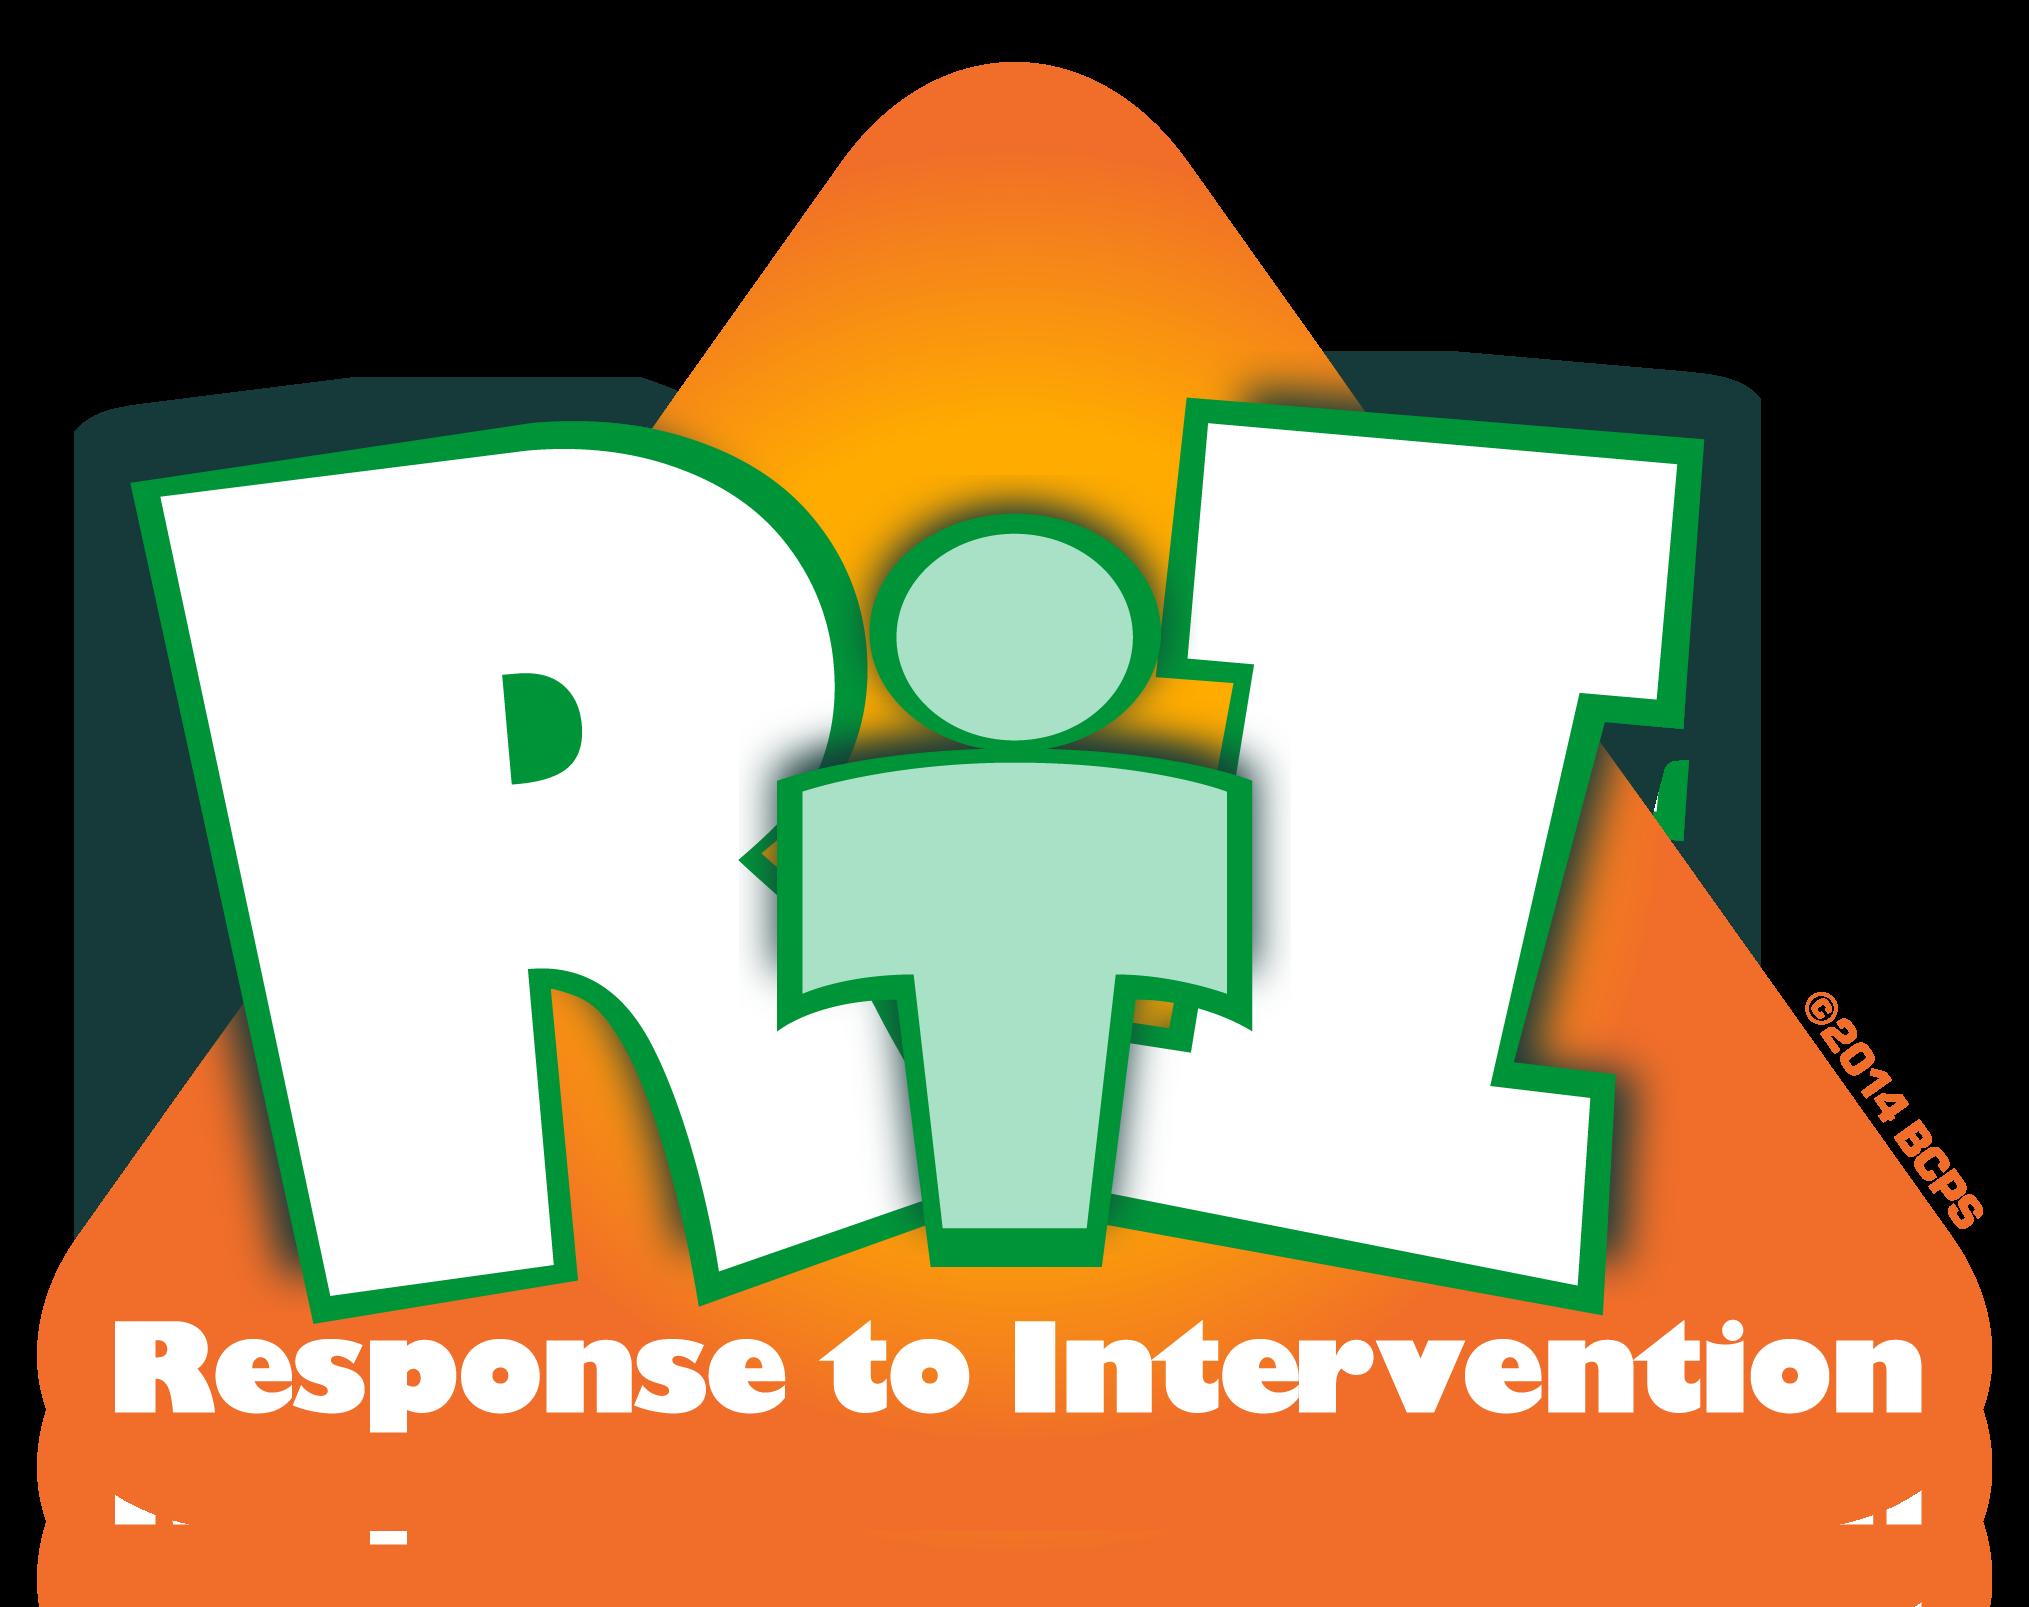 Collaboration clipart school based management. Broward prevention rti rtilogos